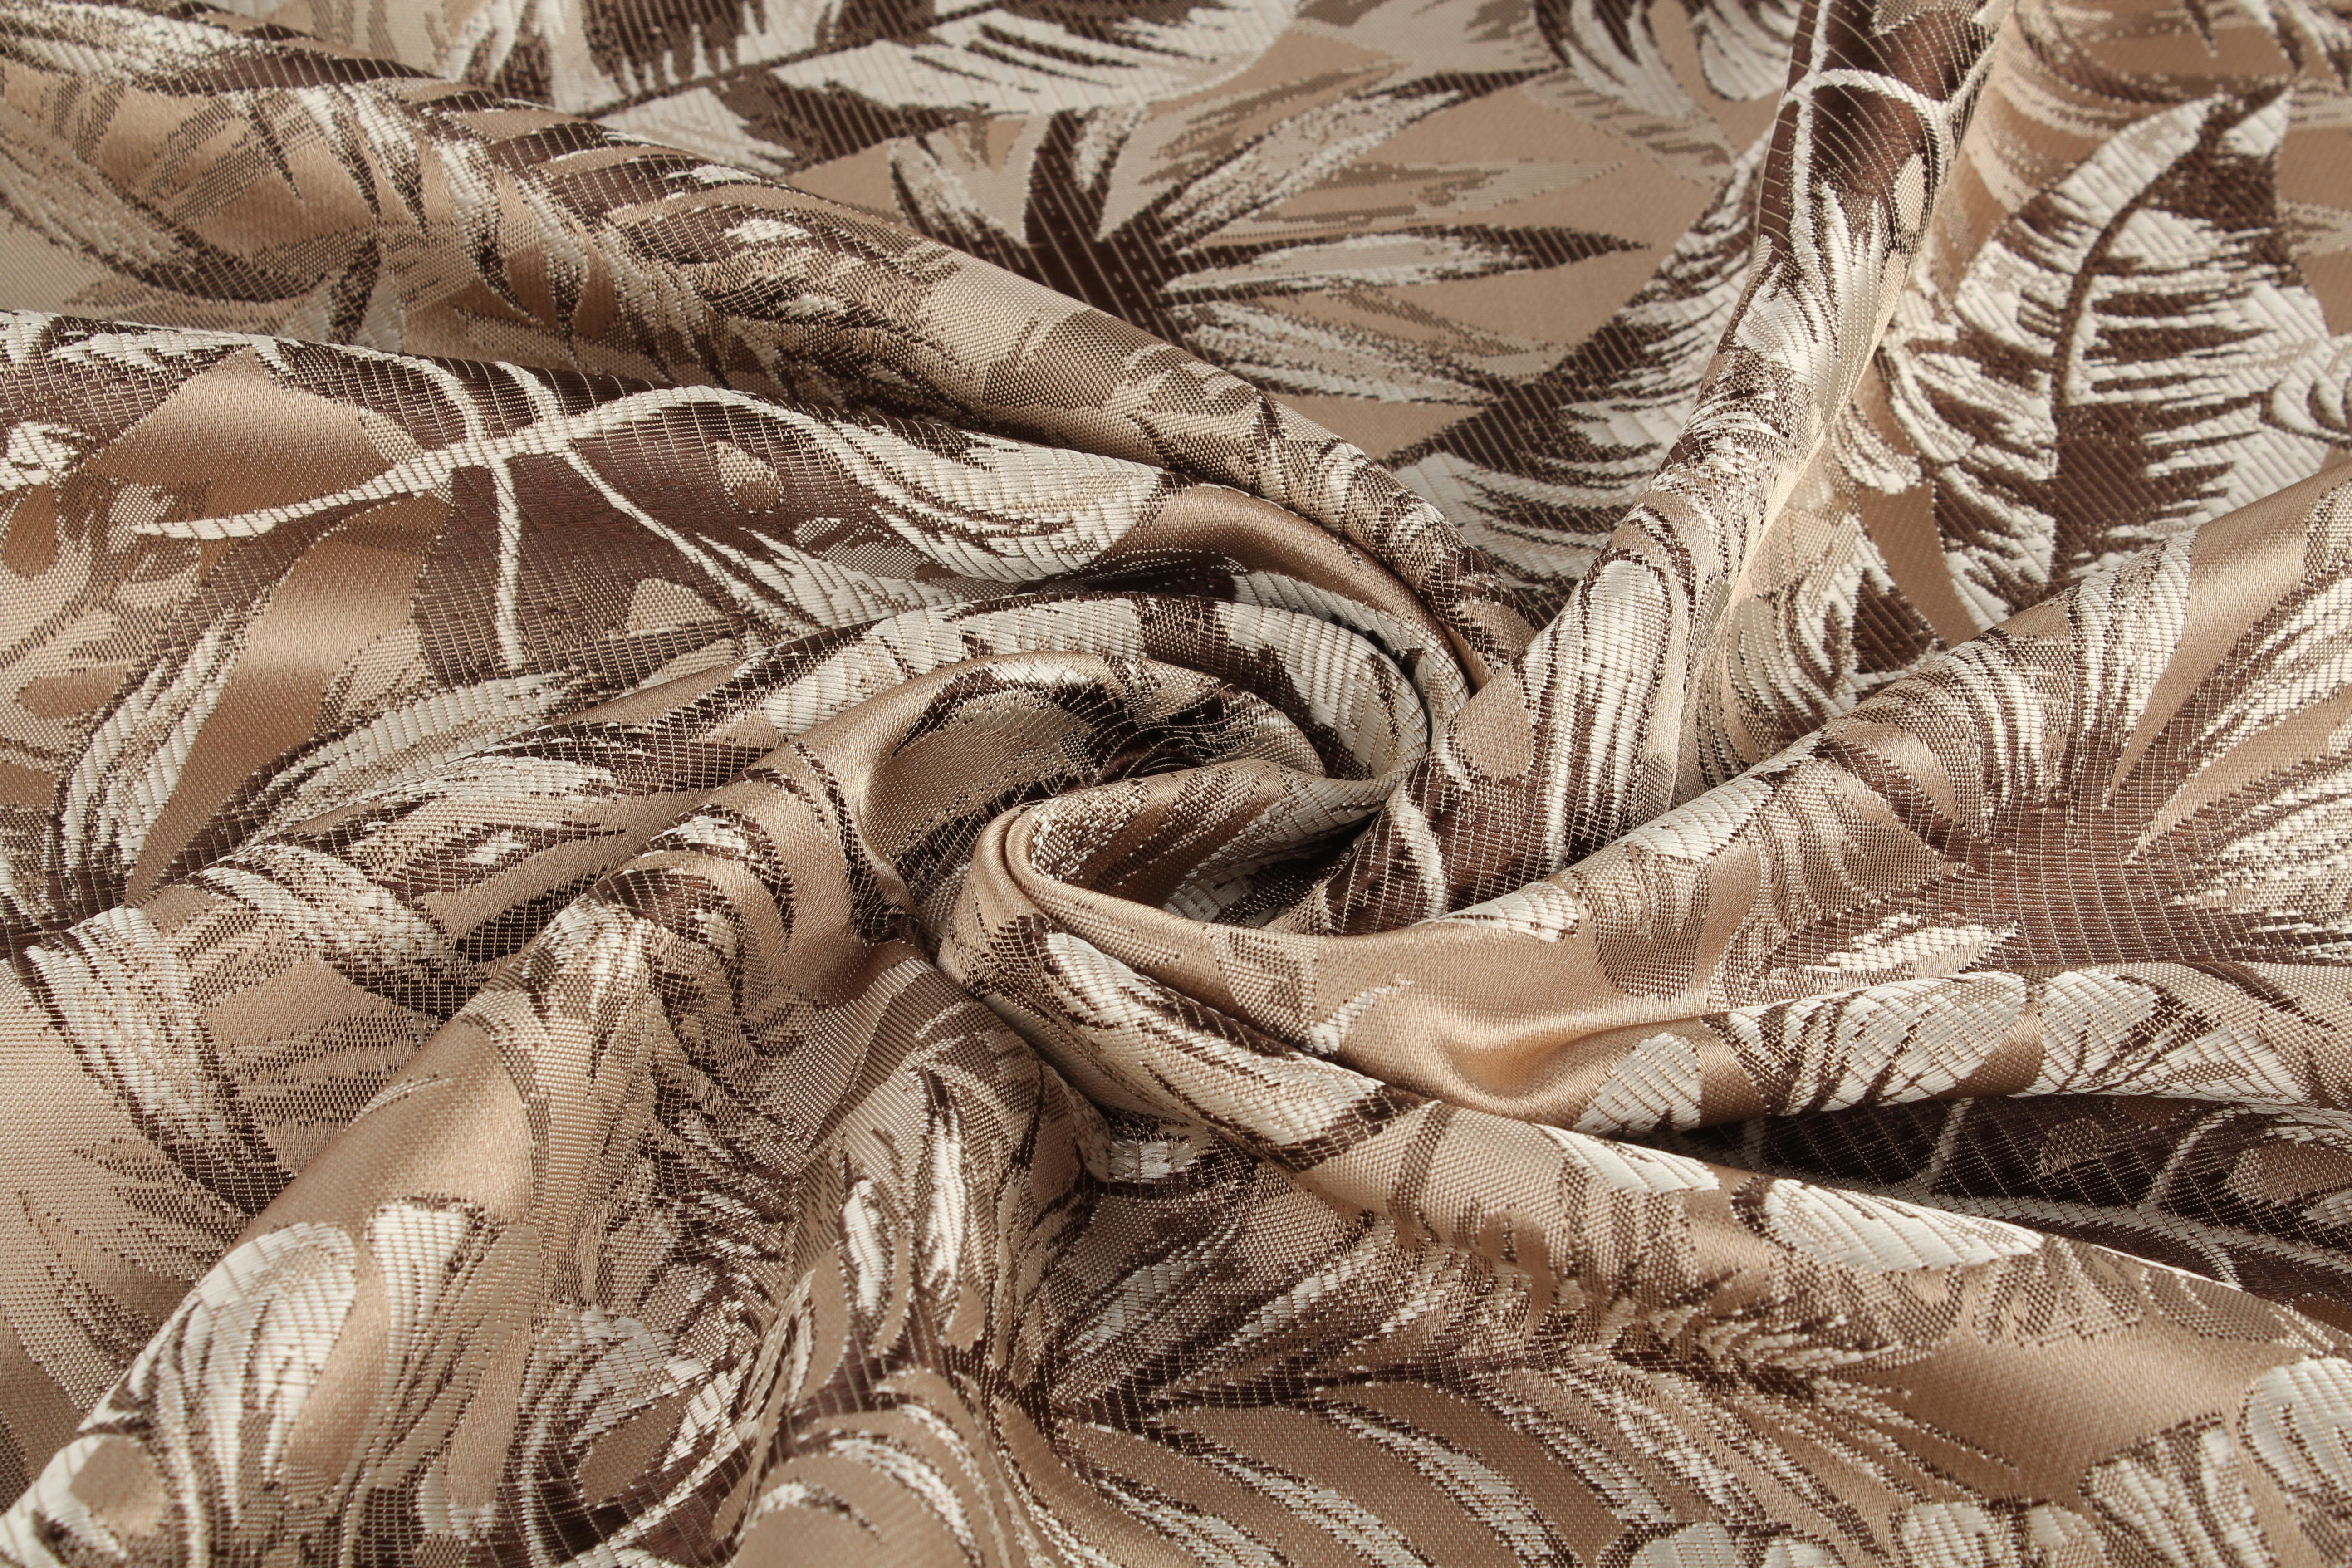 Ткани TexRepublic, Материал Жаккард Monstera Цвет: Коричневый, Турция  - Купить